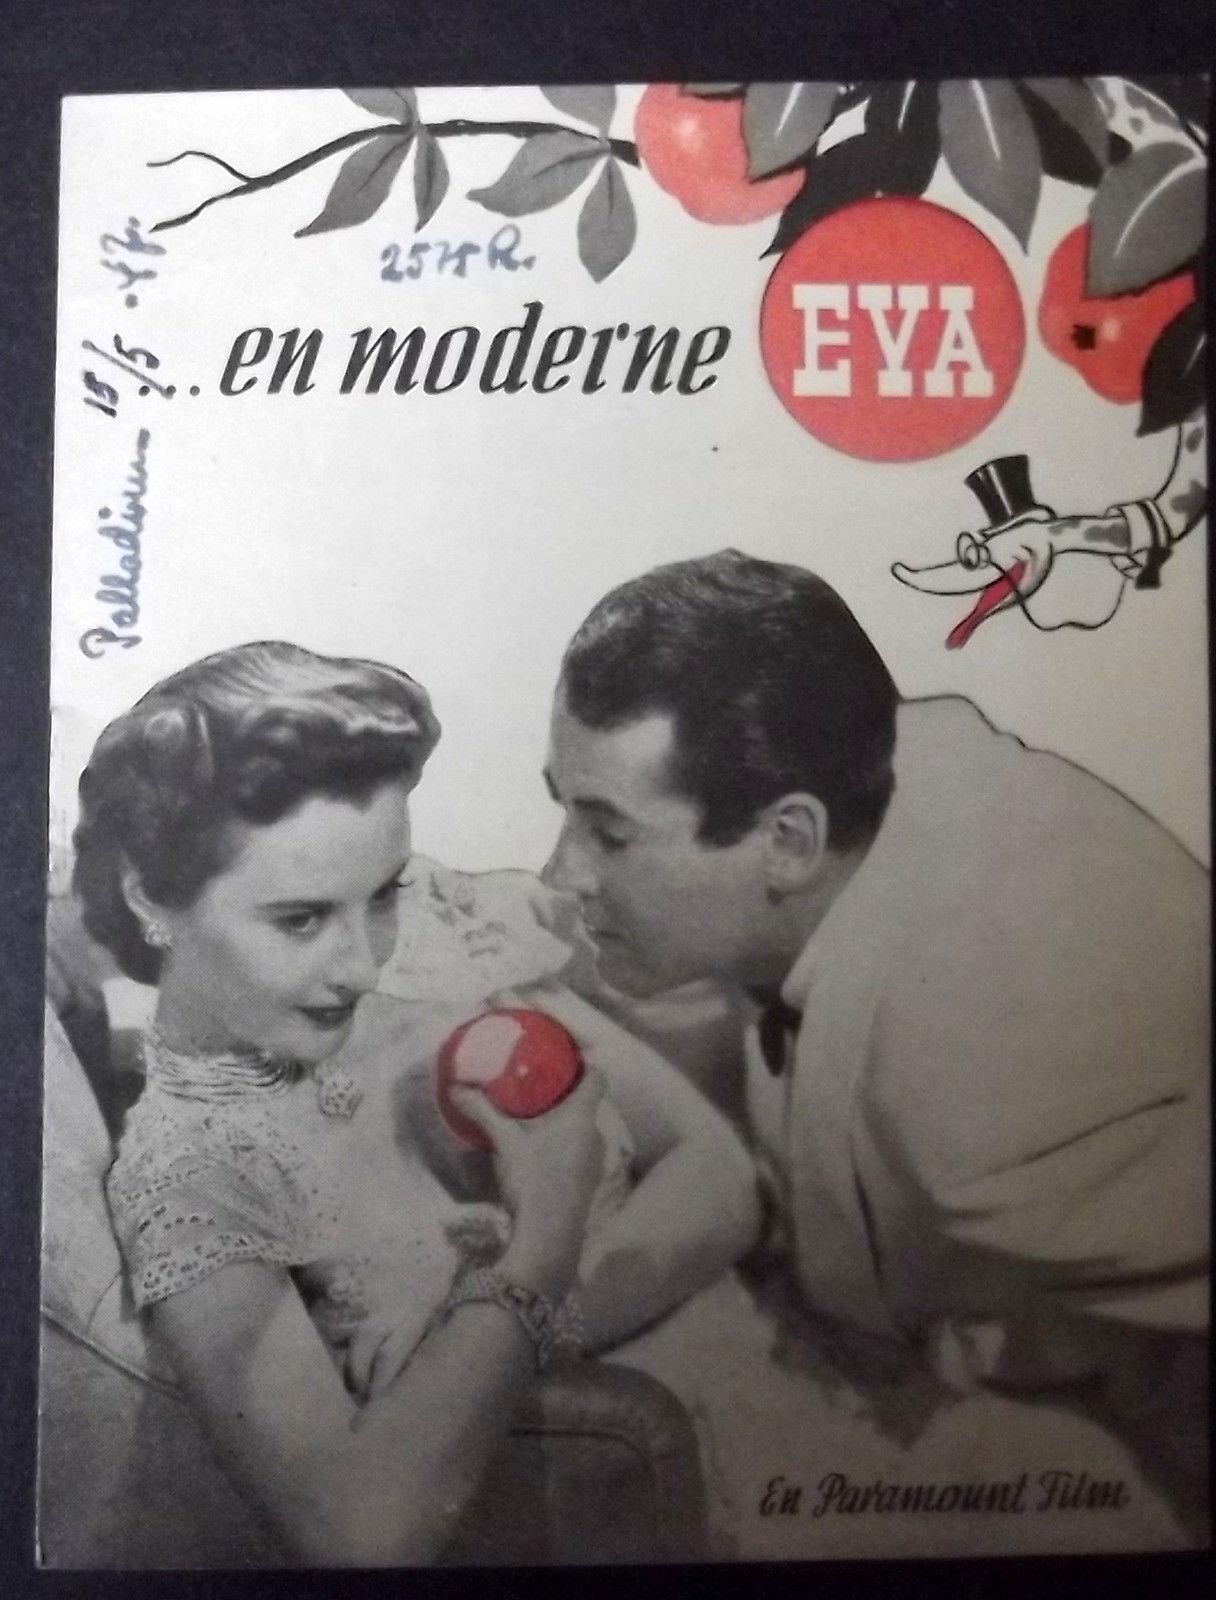 PRESTON STURGES,H.FONDA B. STANWYCK (THE LADY EVE)  RARE 1940,S EURO PROGRAM